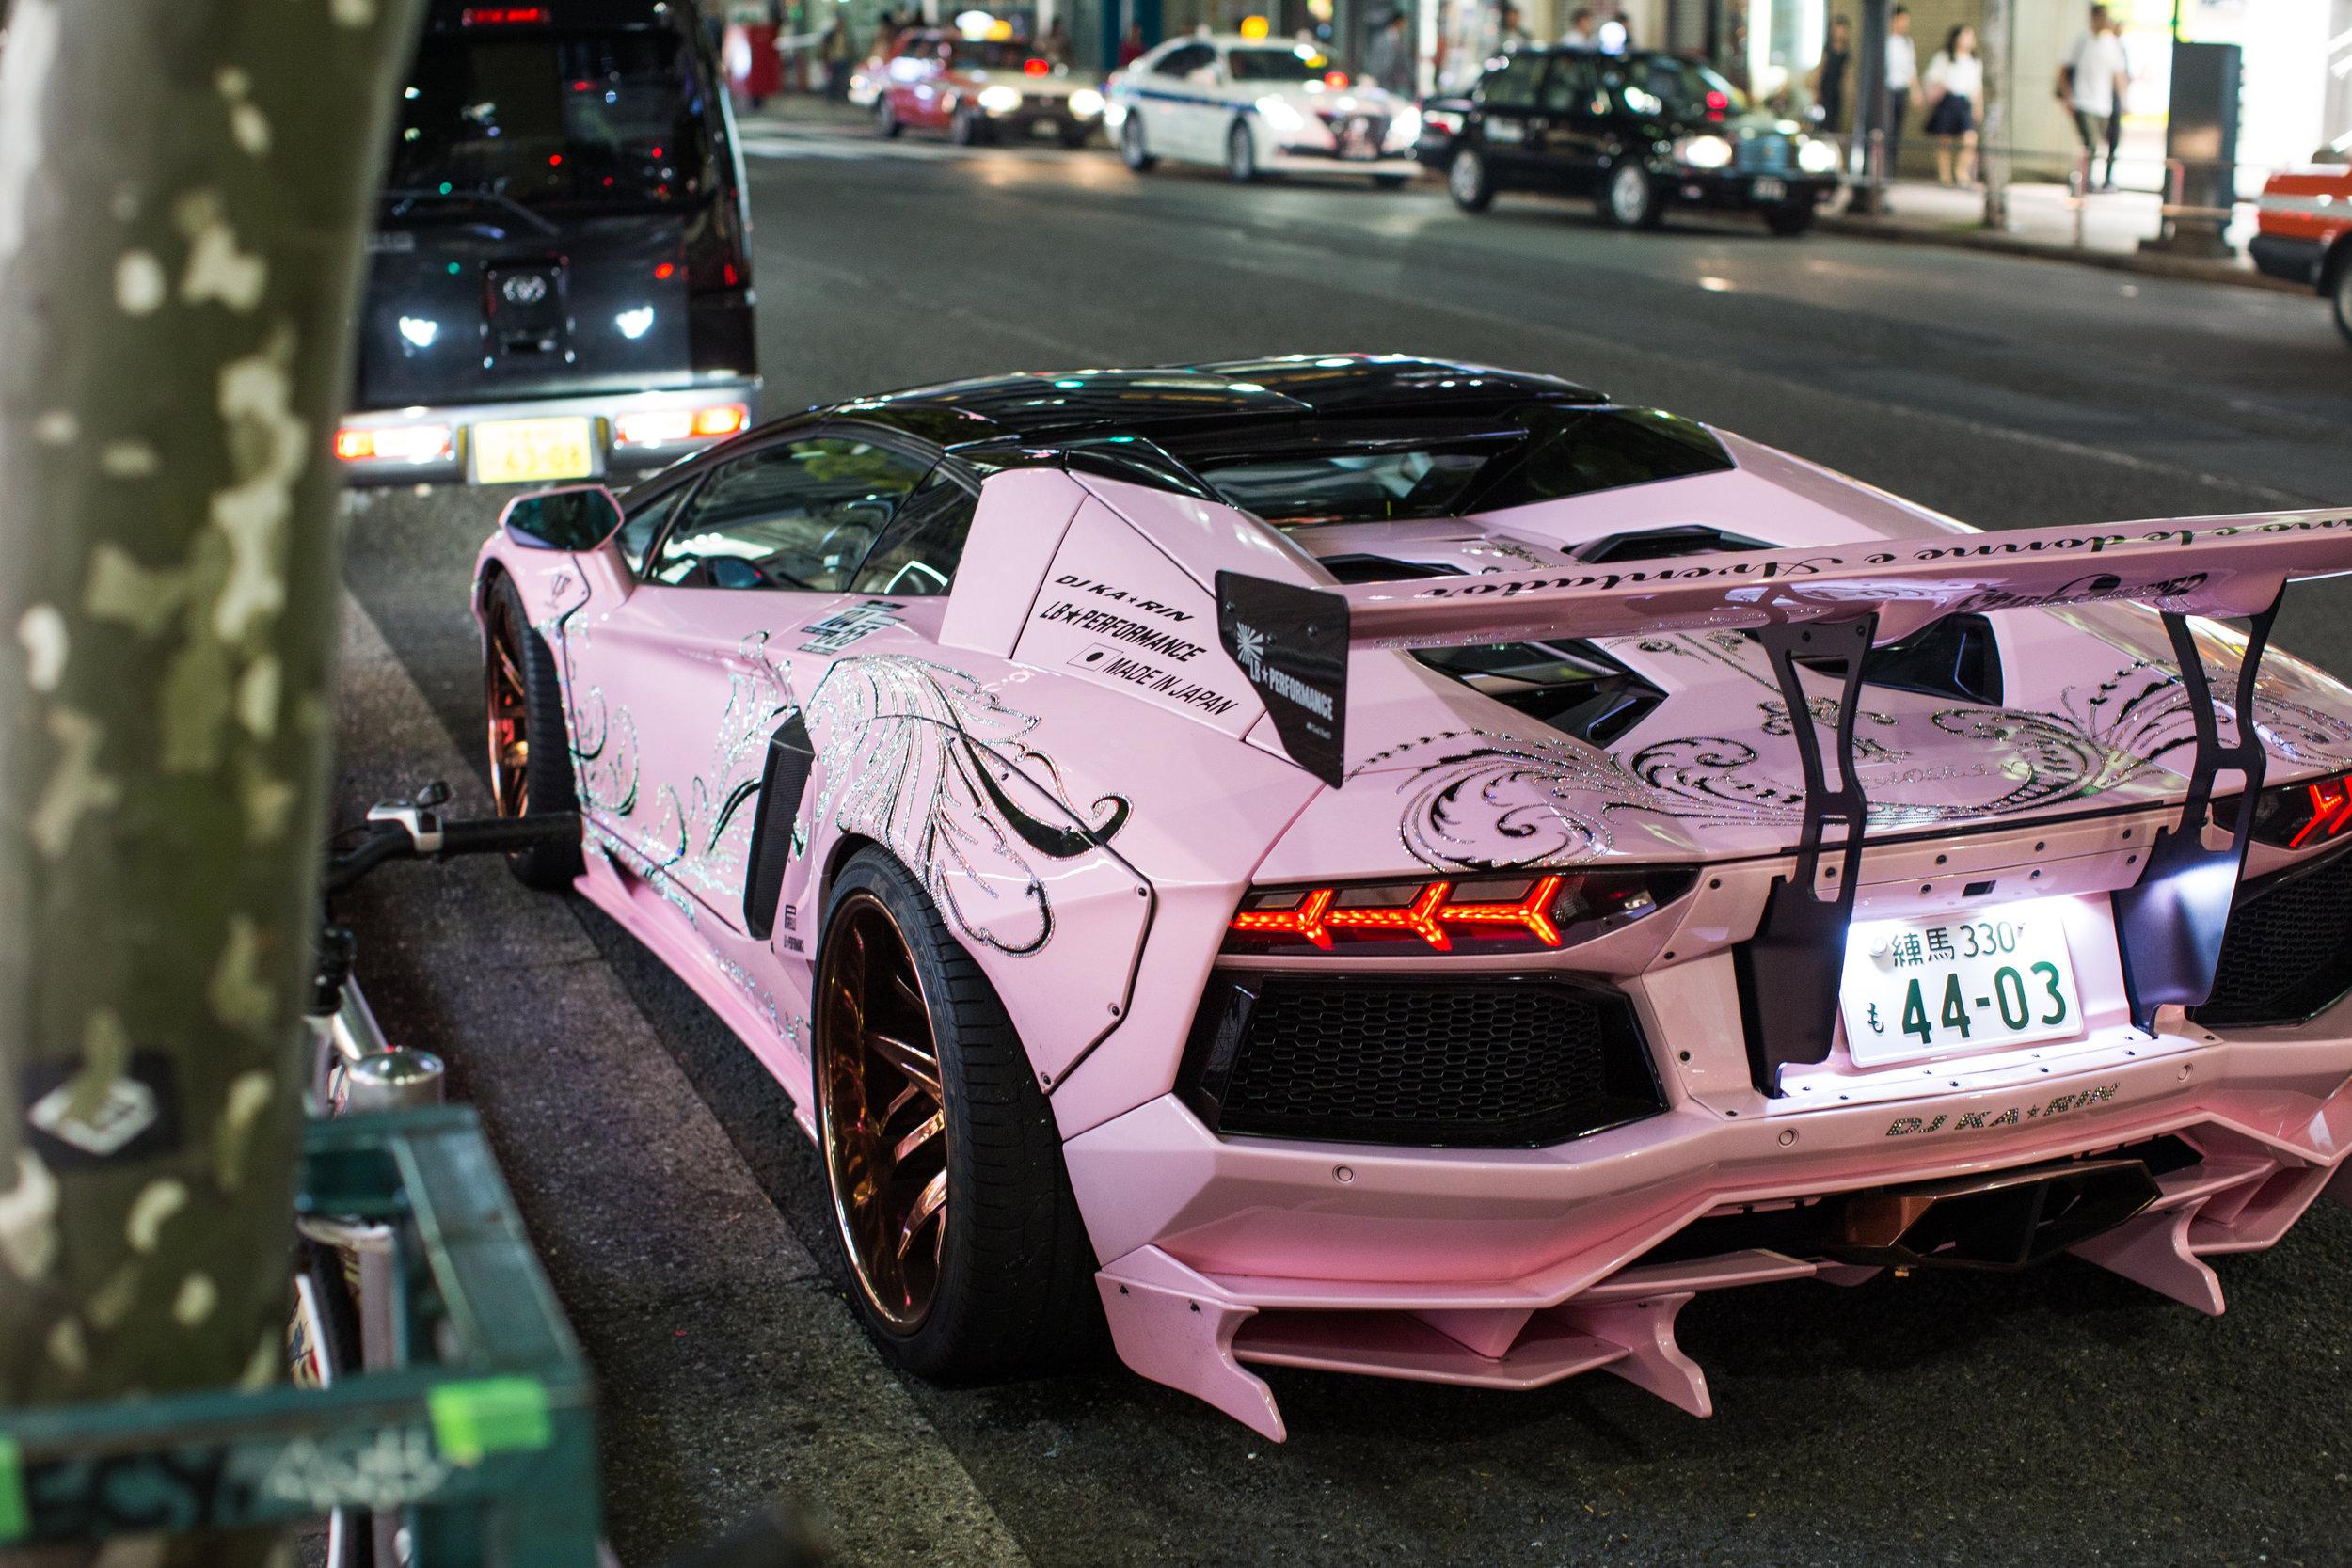 ' Powerglide ' by Rae Sremmurd | DJ KARIN's infamous pink and copper Lamborghini Aventador.